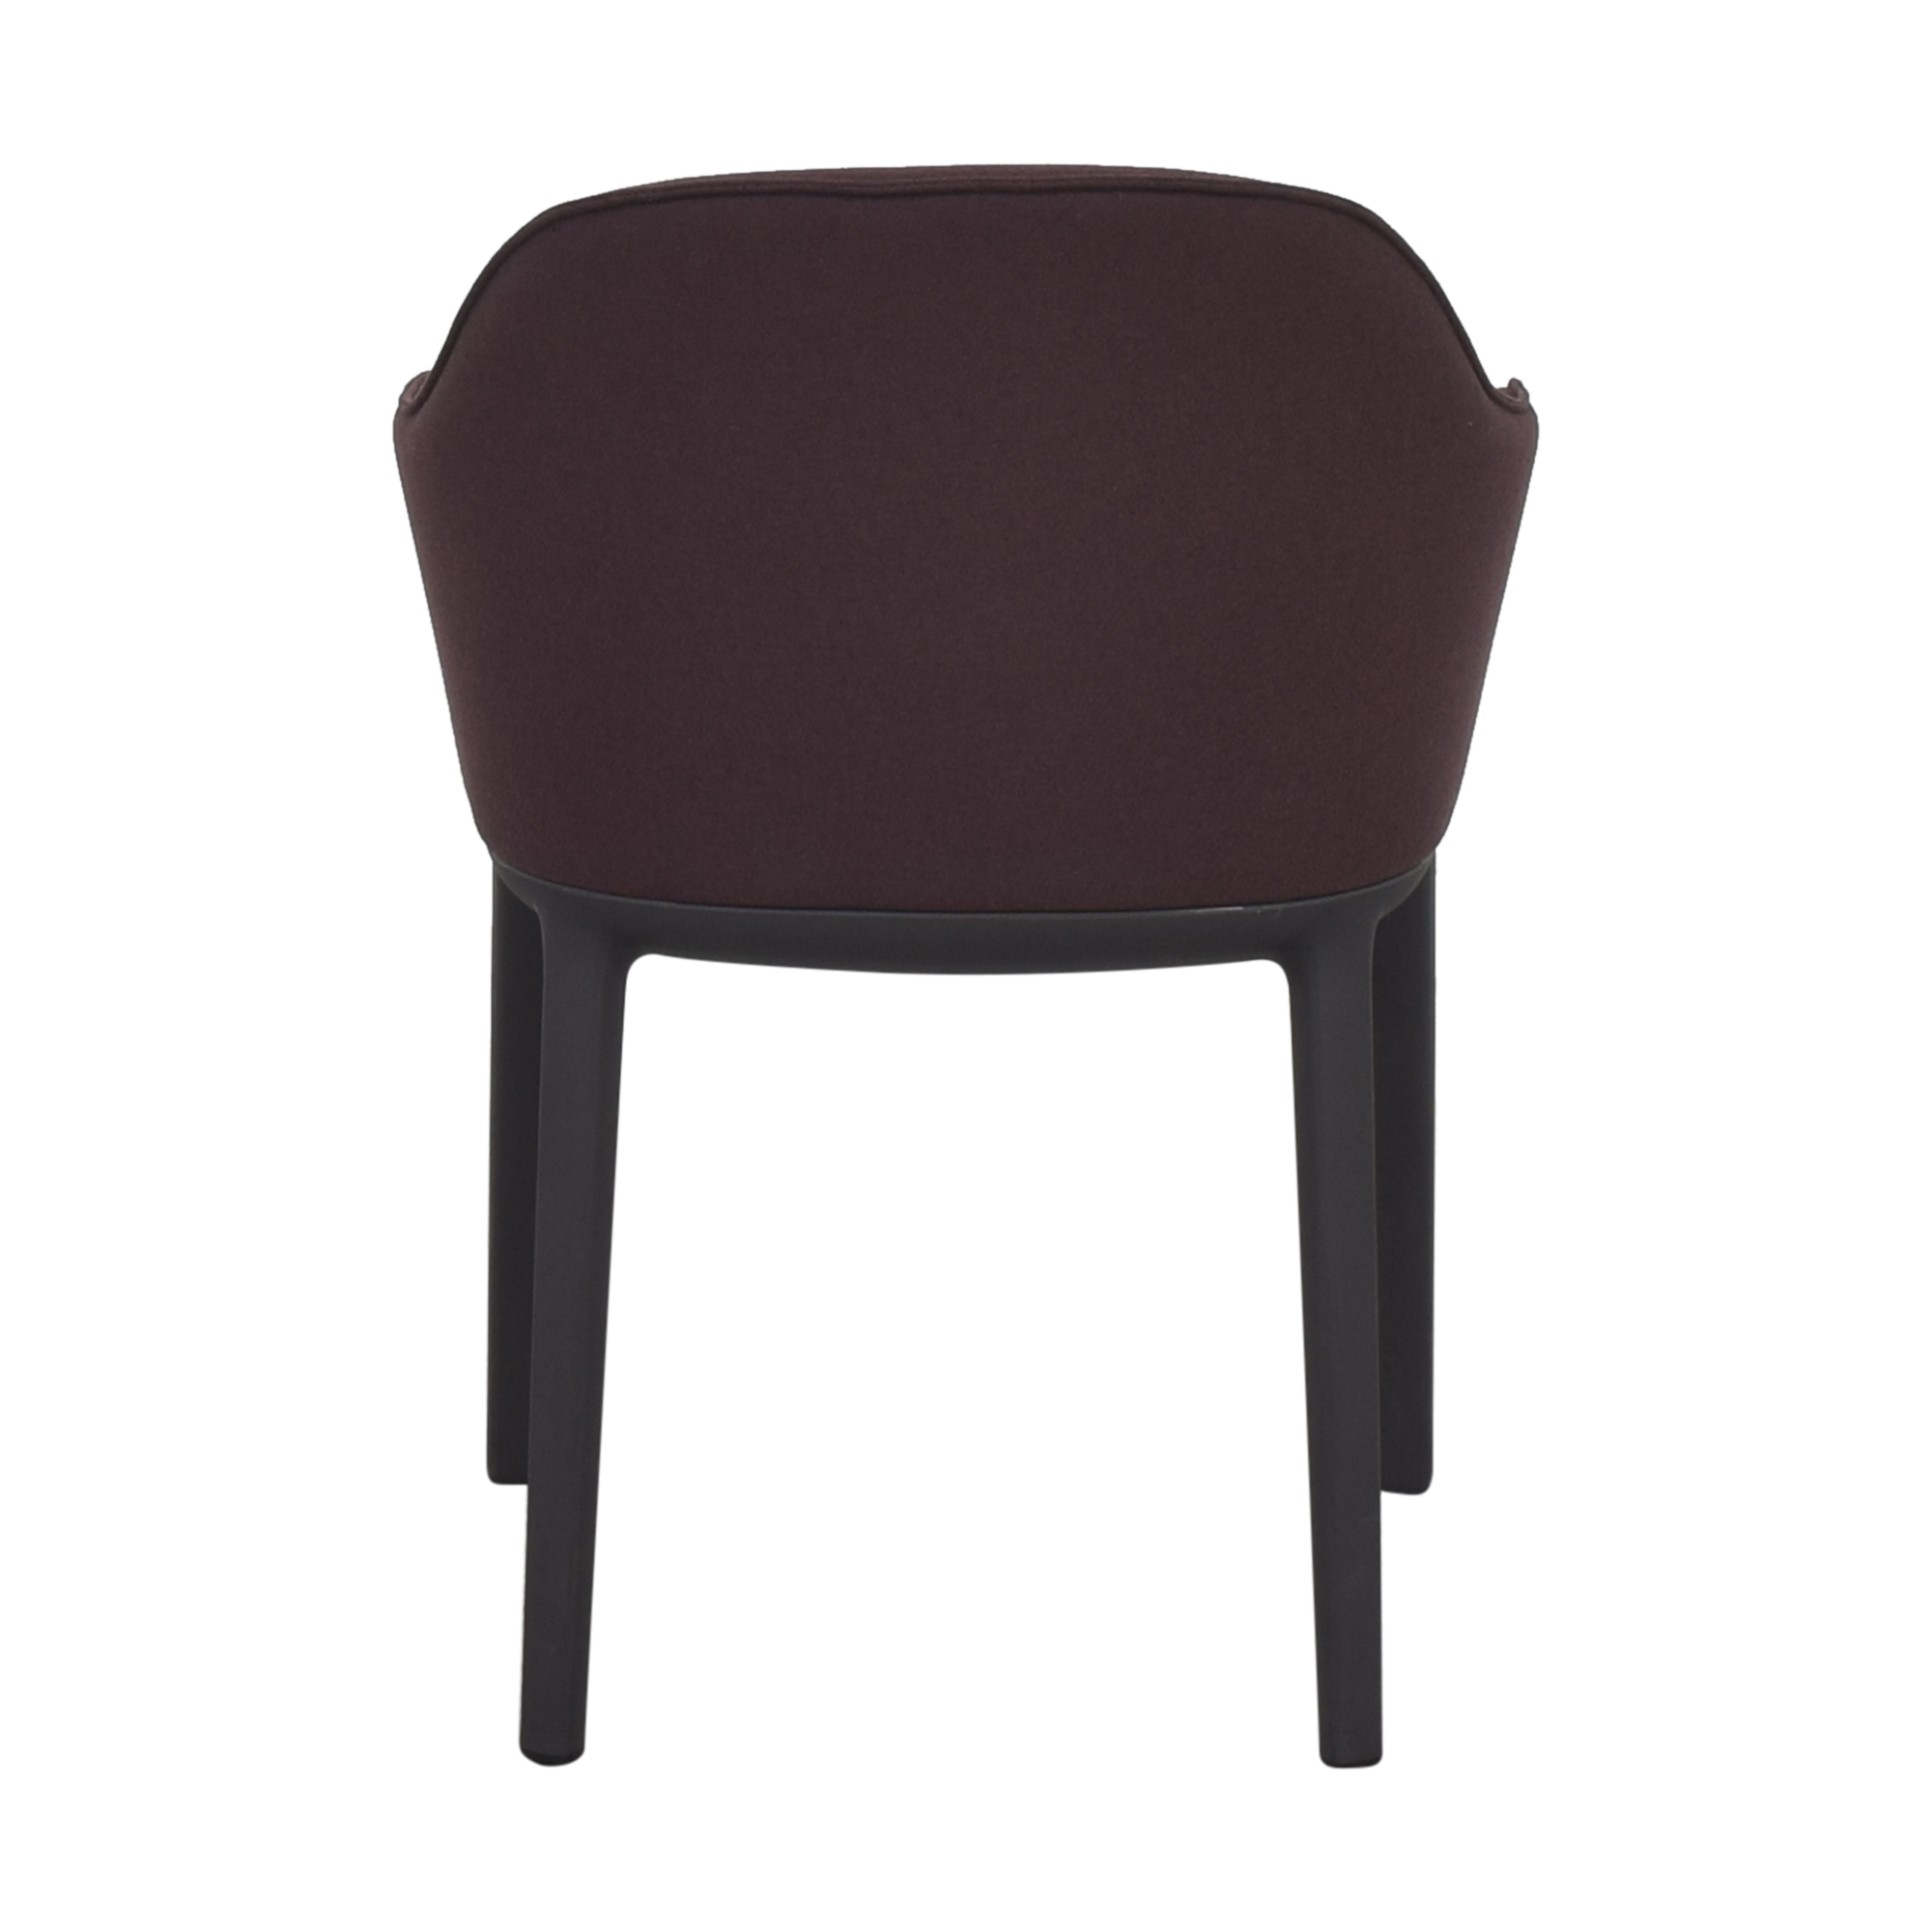 Vitra Vitra Softshell Arm Chair coupon